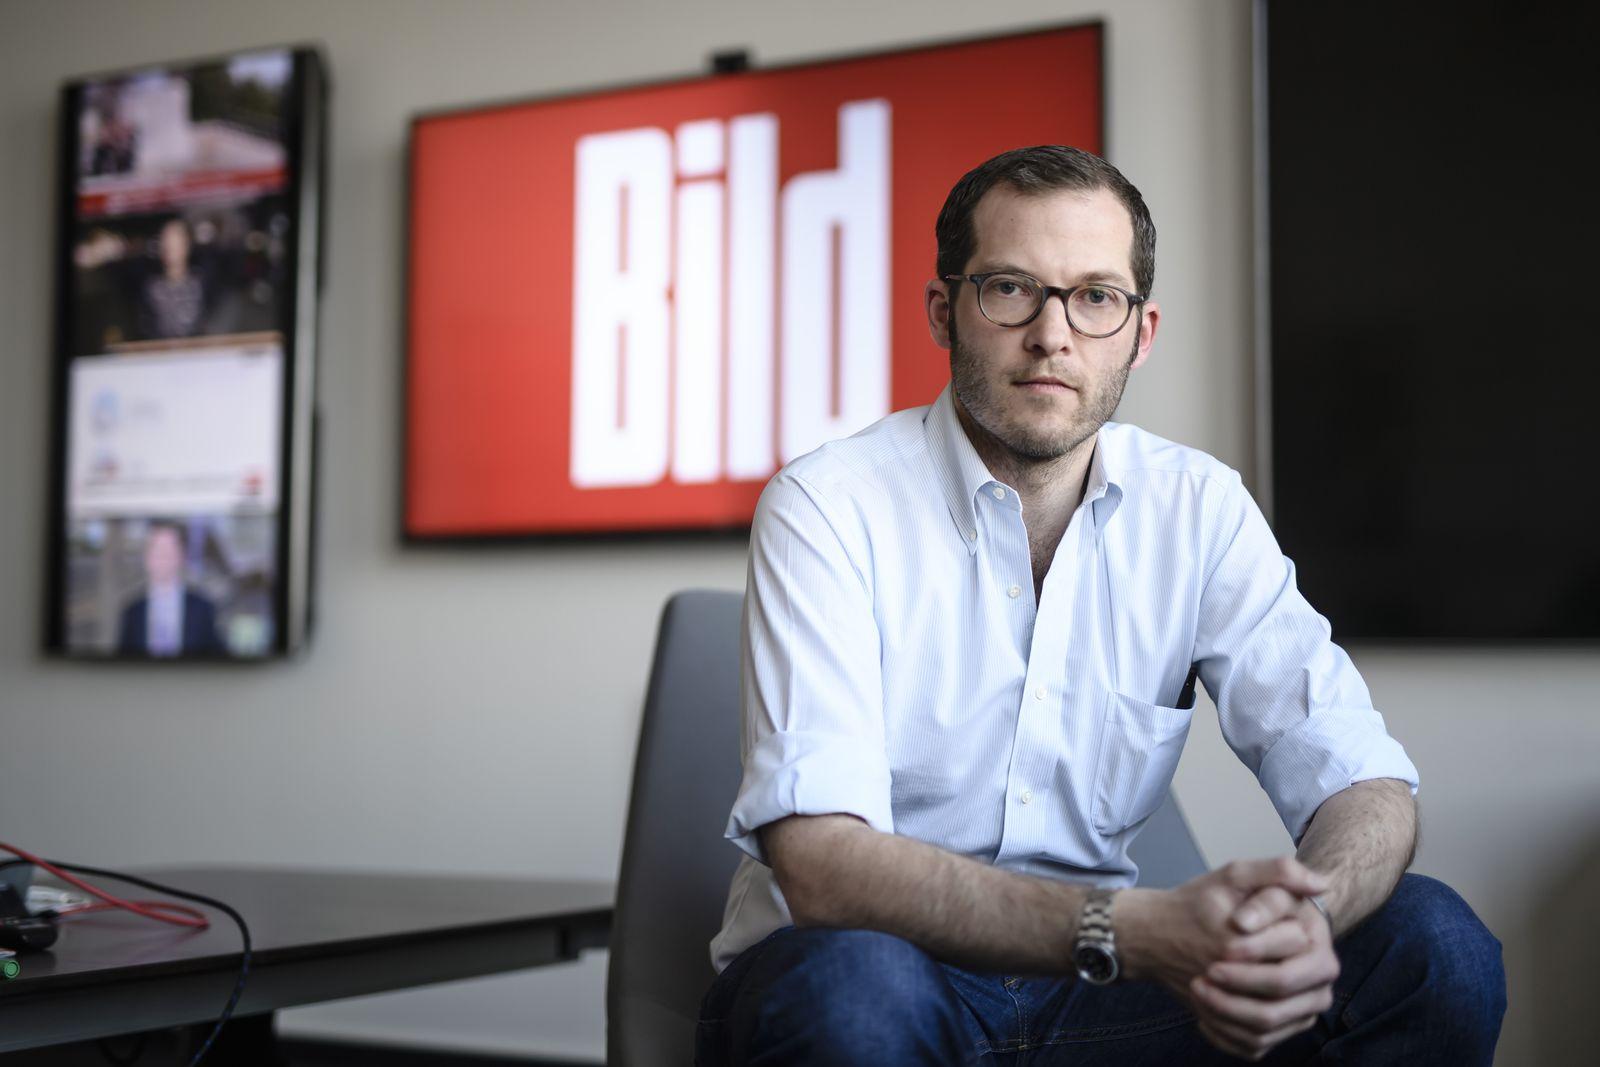 Julian Reichelt appointed as Chairman of BILD chief editors, Berlin, Germany - 10 Feb 2017